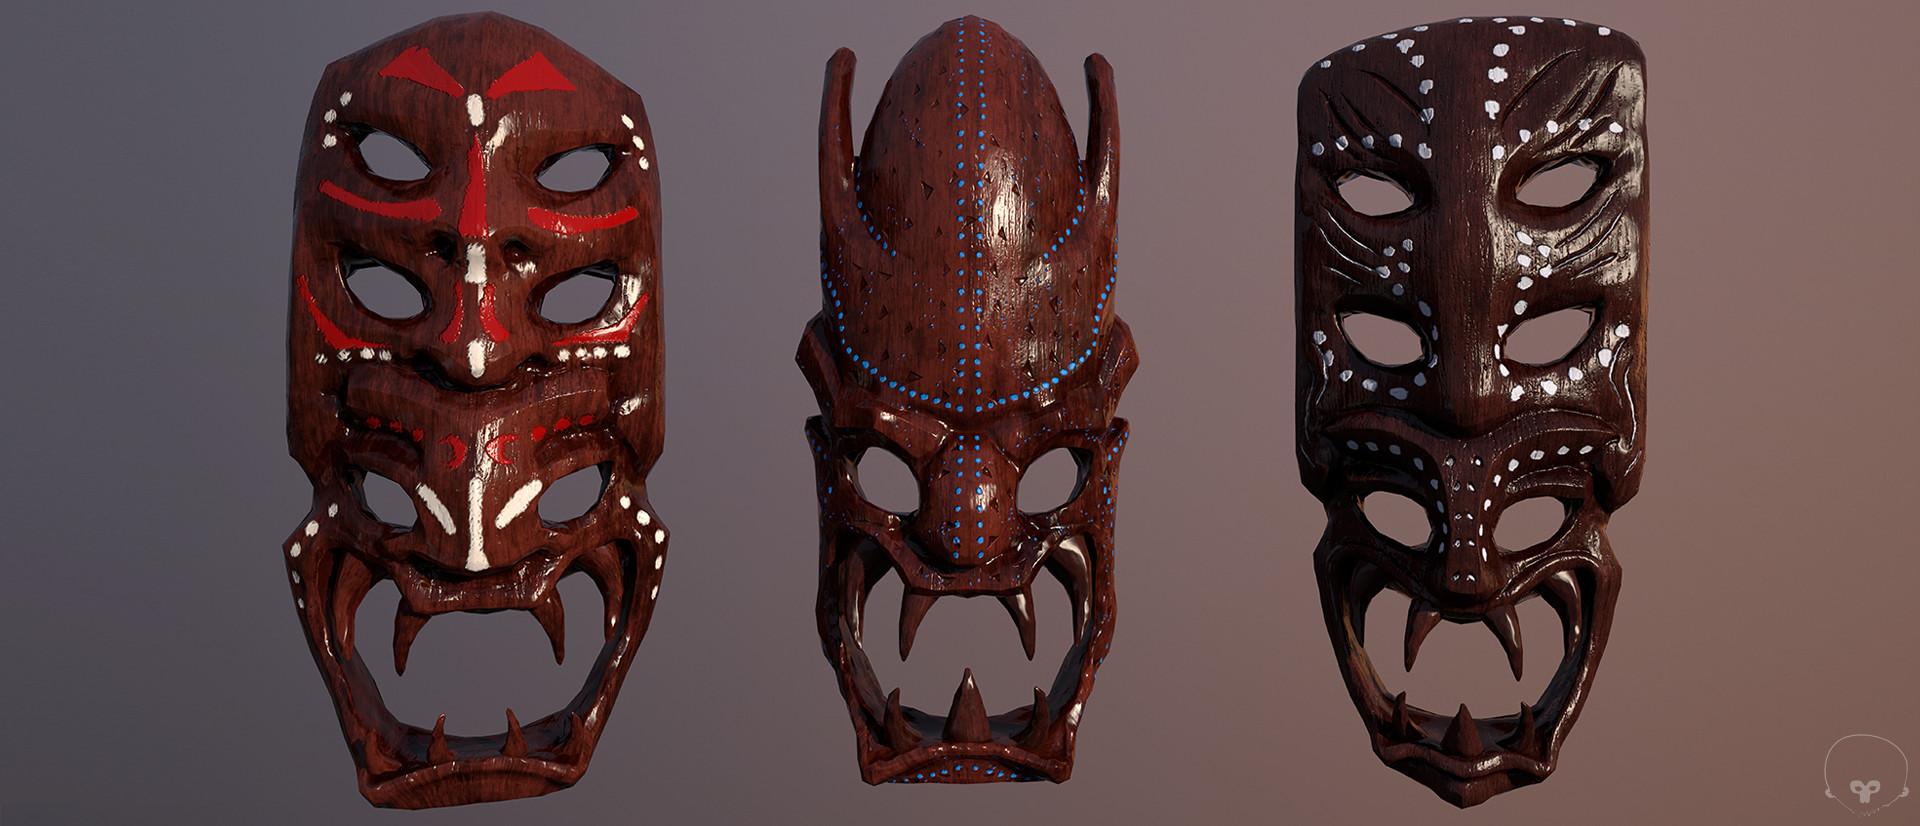 Paul mandegarian masks 02